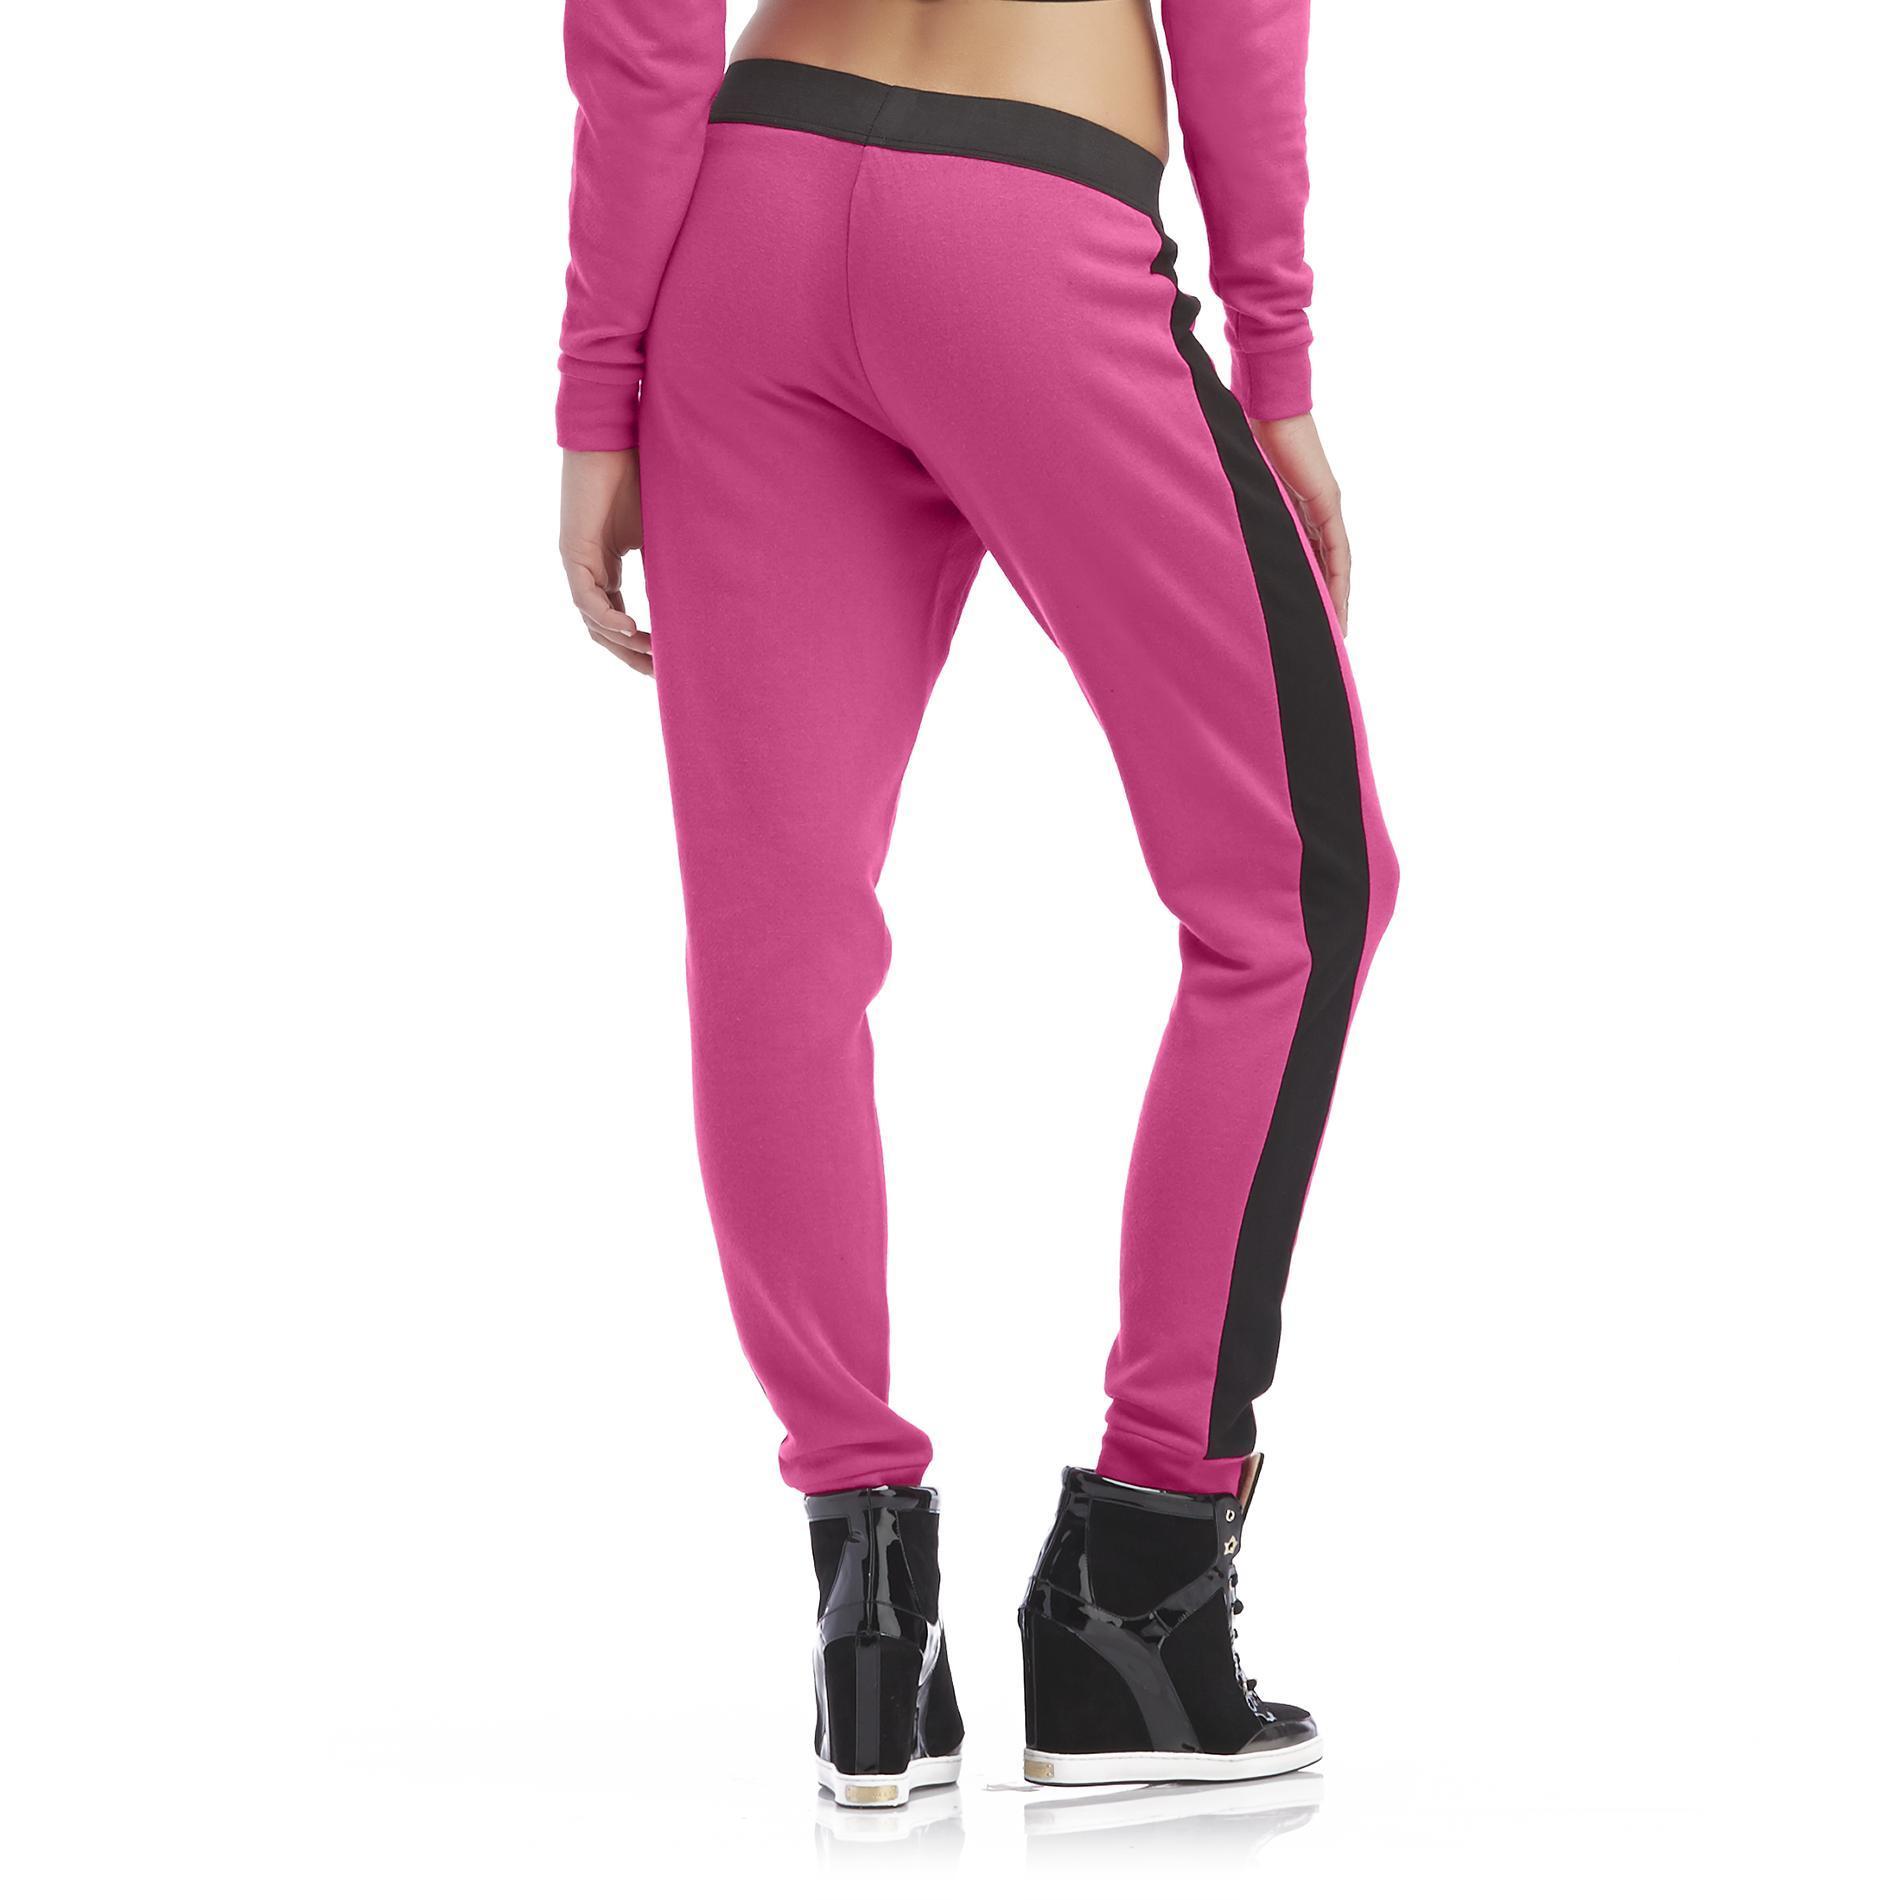 Nicki Minaj Women's Sweatpants - Colorblock